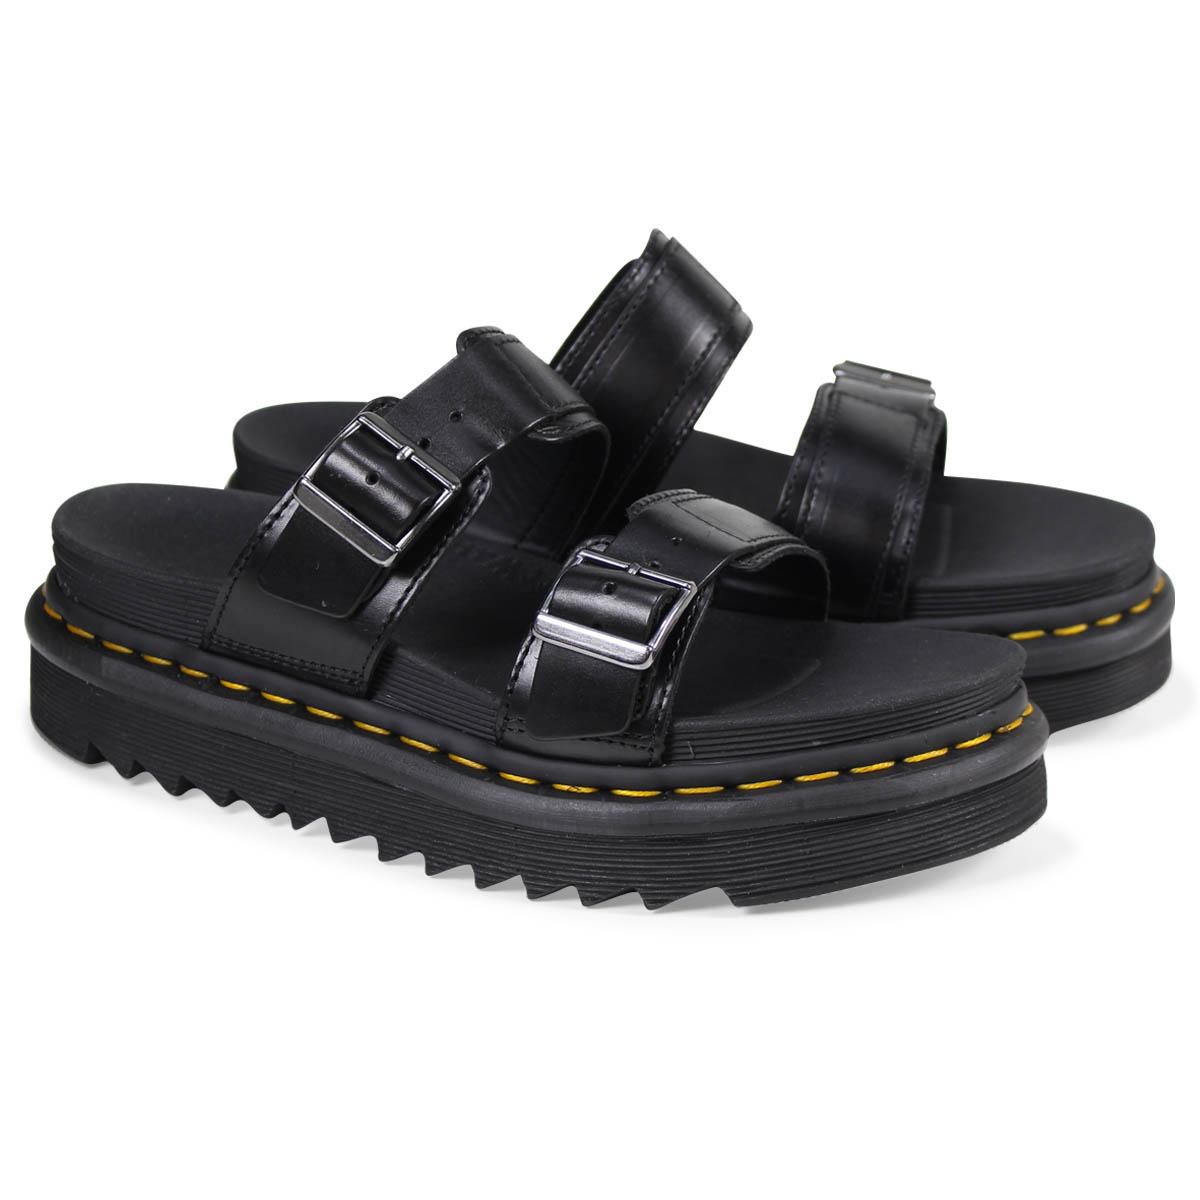 3c99170a0f5cf3 Dr.Martens MYLES SANDAL doctor Martin miles men gap Dis sandals black  R23523001  2 14 Shinnyu load